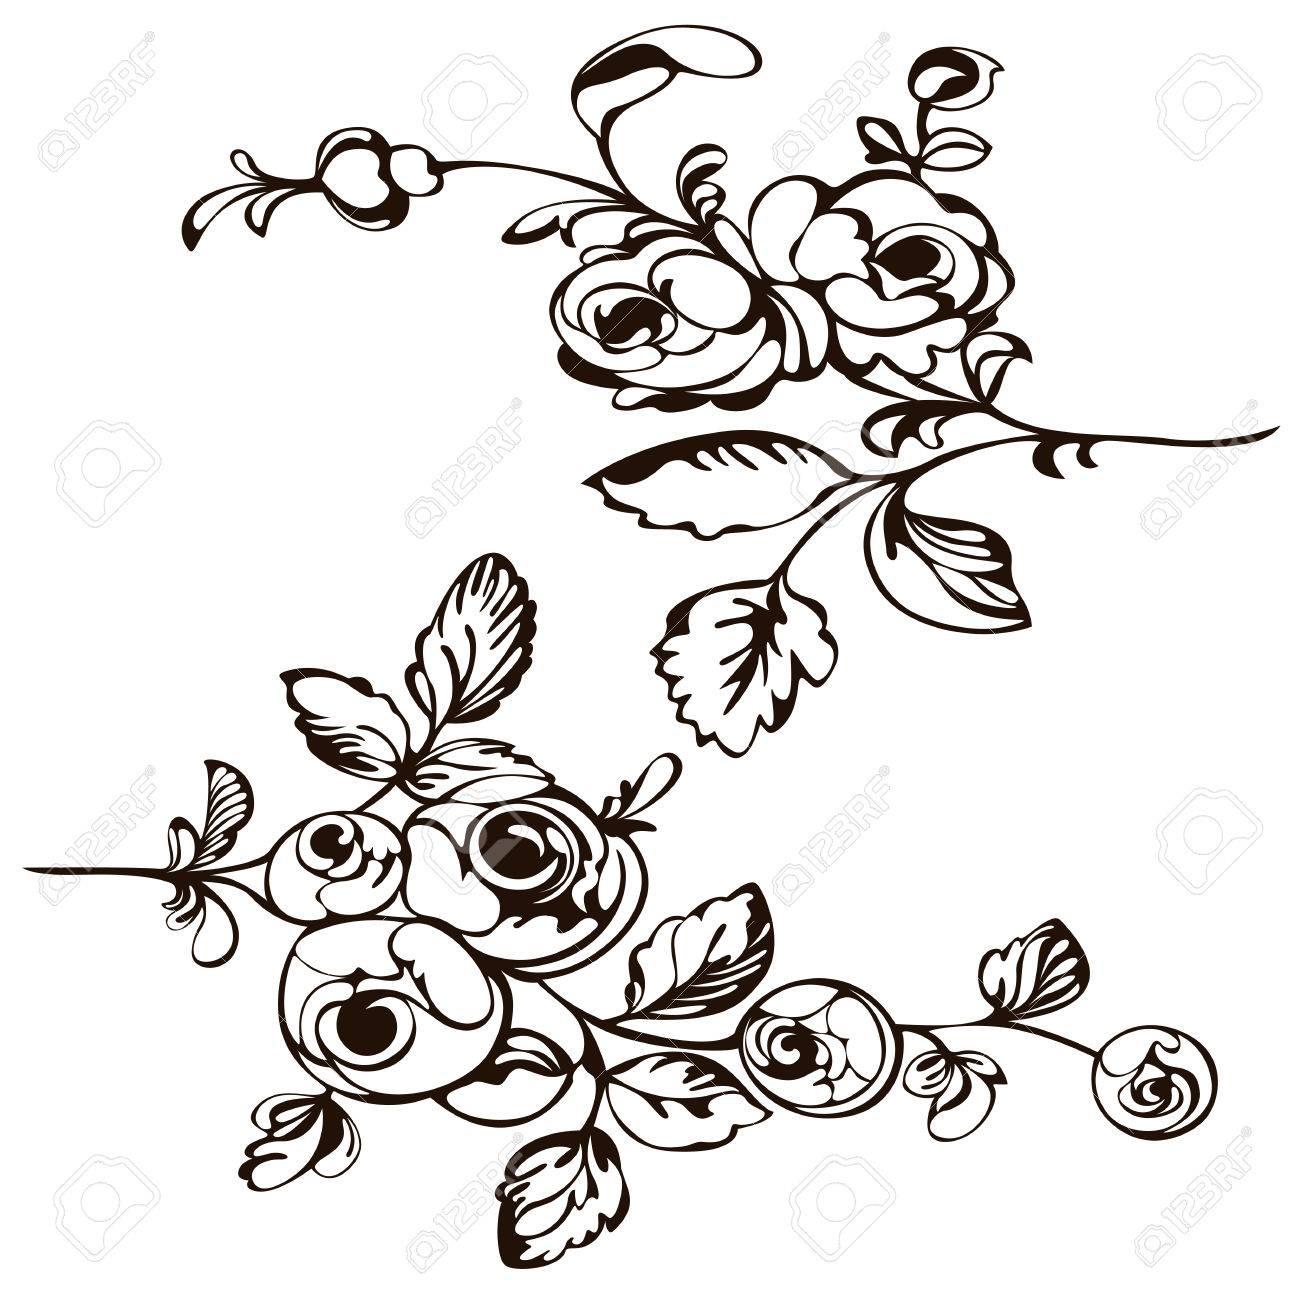 Drawing Pattern Flower Painting Closeup Rose Black White Royalty